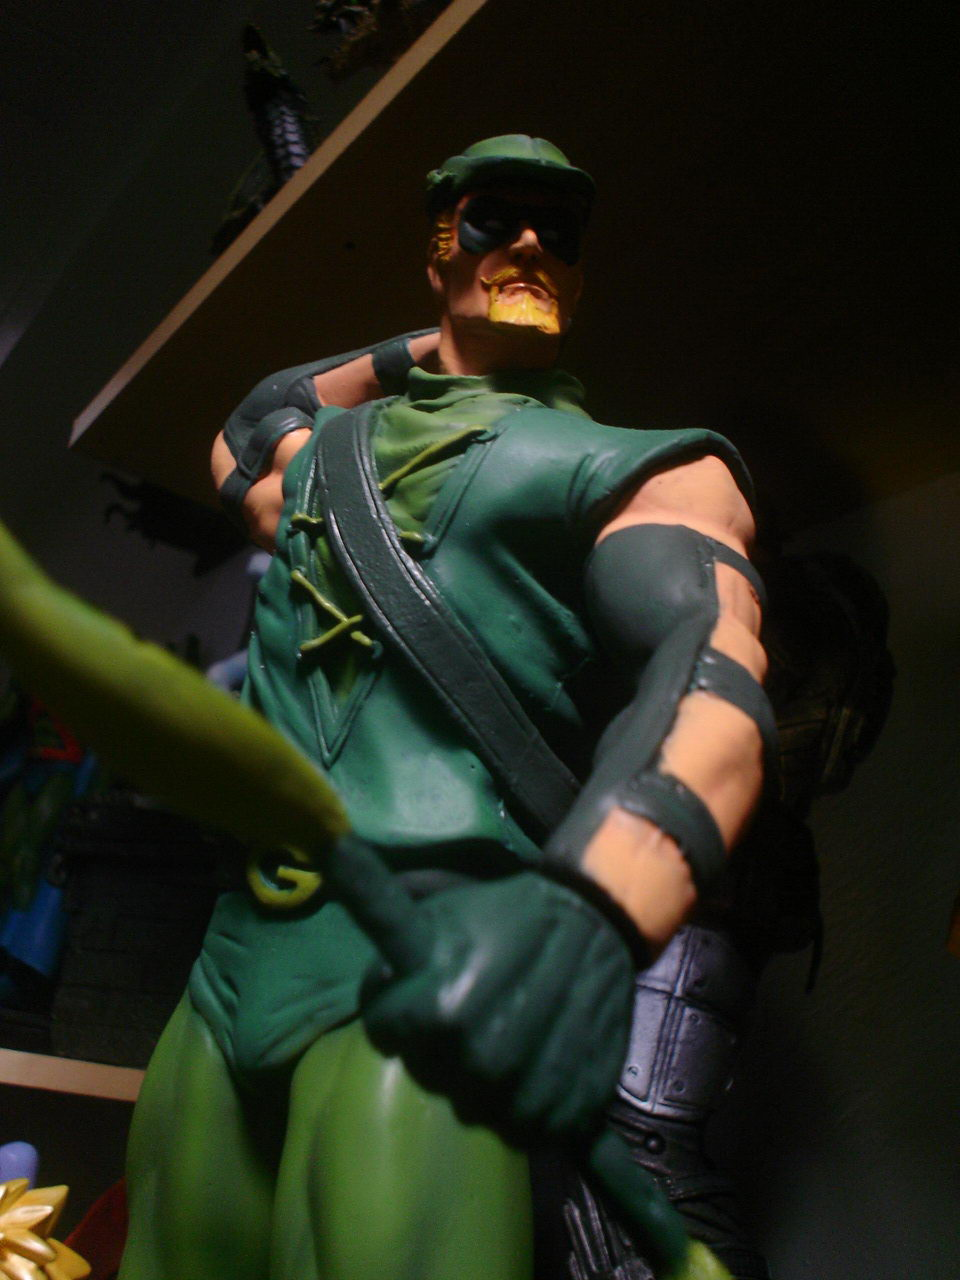 Action Figures: Marvel, DC, etc. Green_arrow_from_dc_comics_by_jokerzombie-d7grkuu